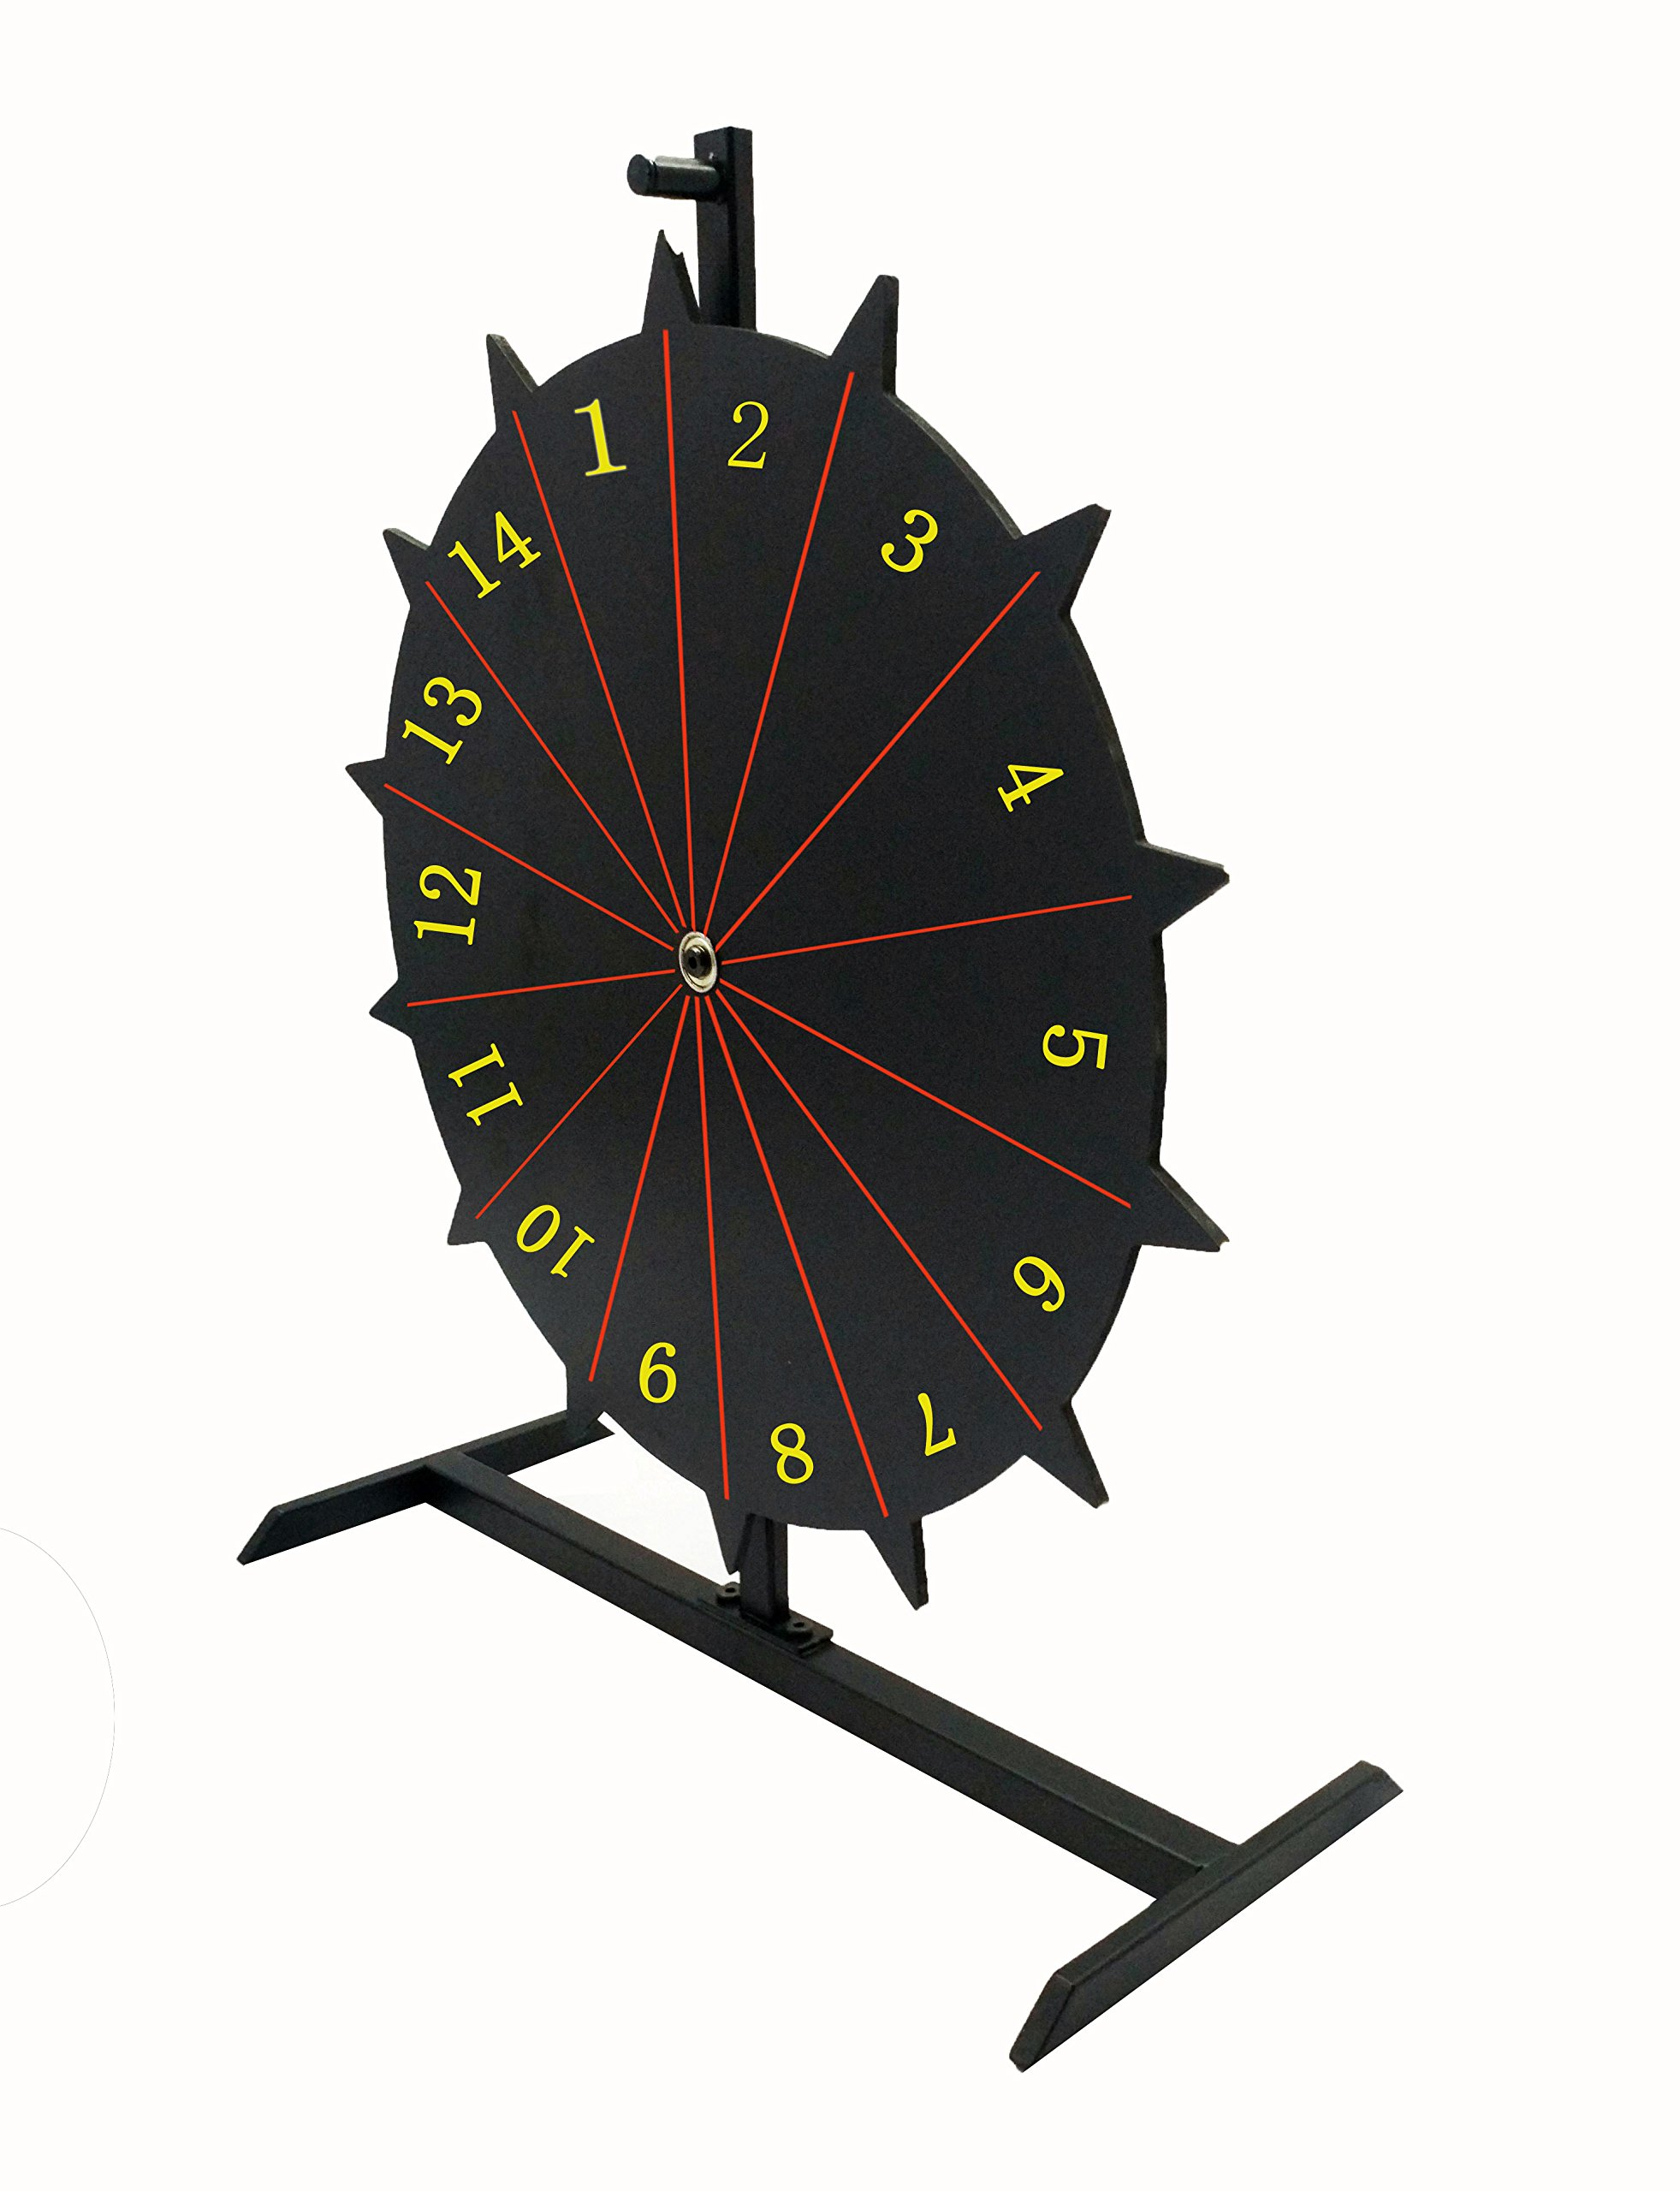 FixtureDisplays 18'' Write-on Prize Wheel 14 Slots Countertop Luckydraw Spinner - Black 119553